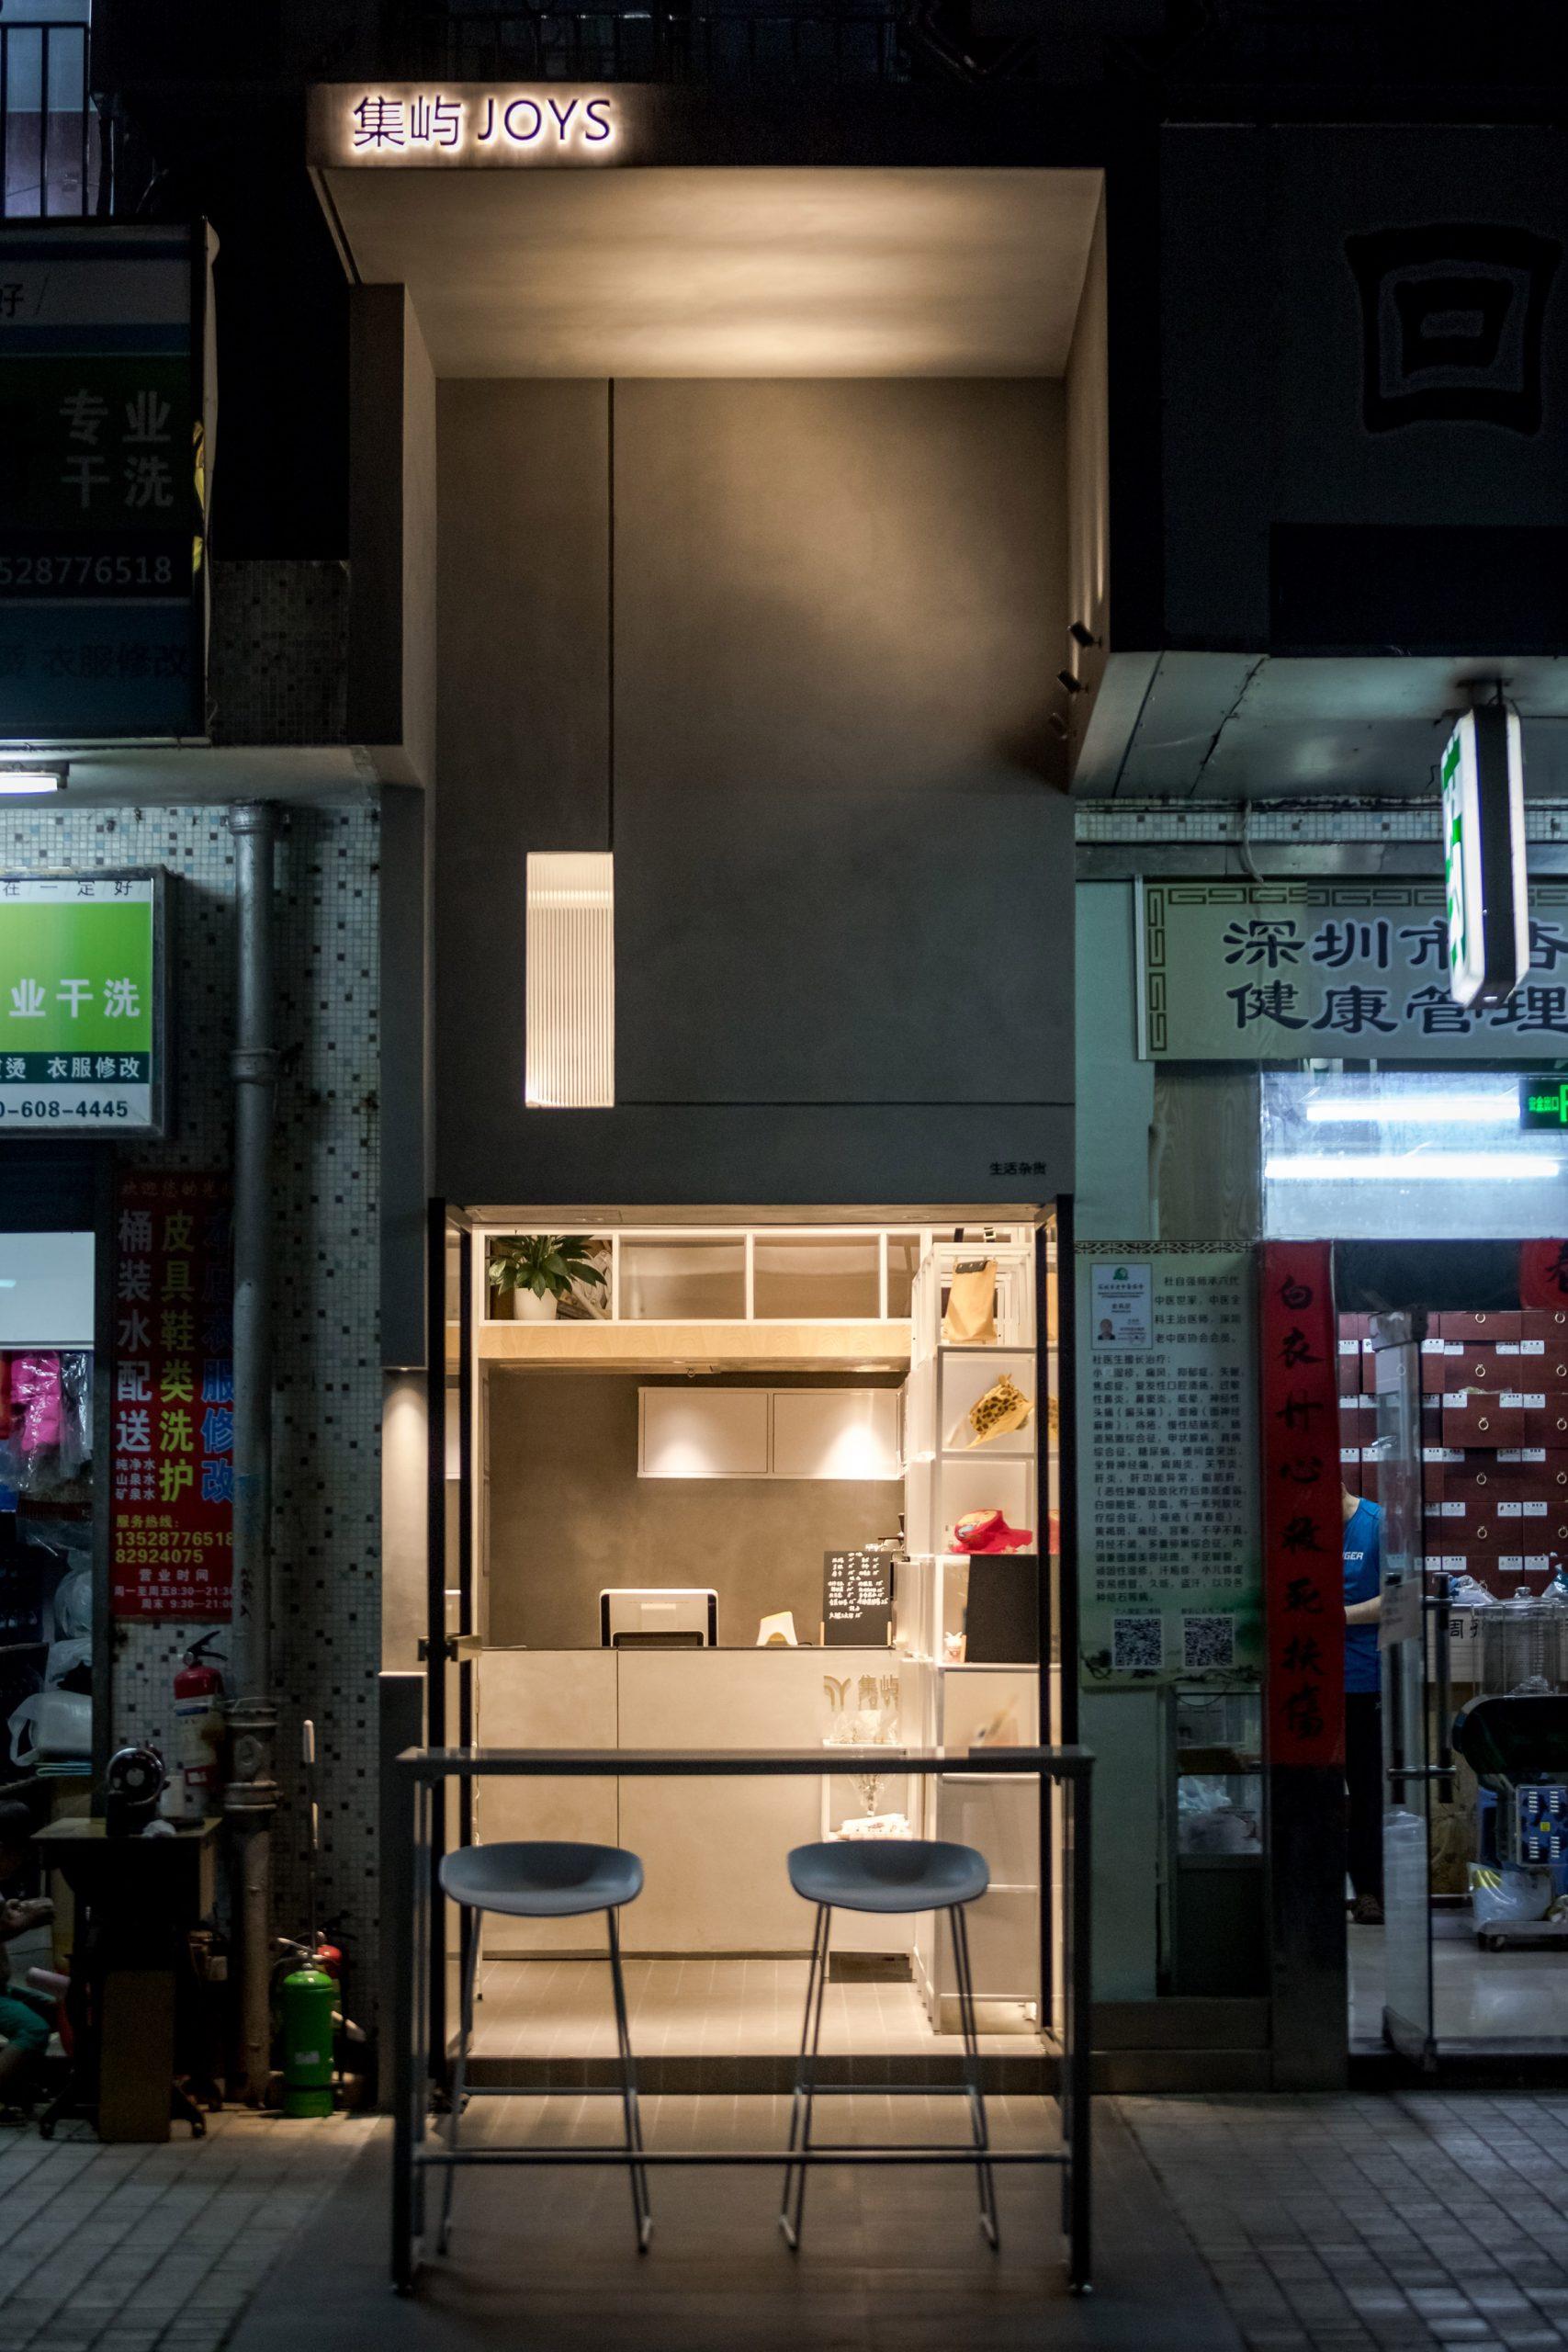 Microcafe joys by Onexn in narrow gap in Shenzhen